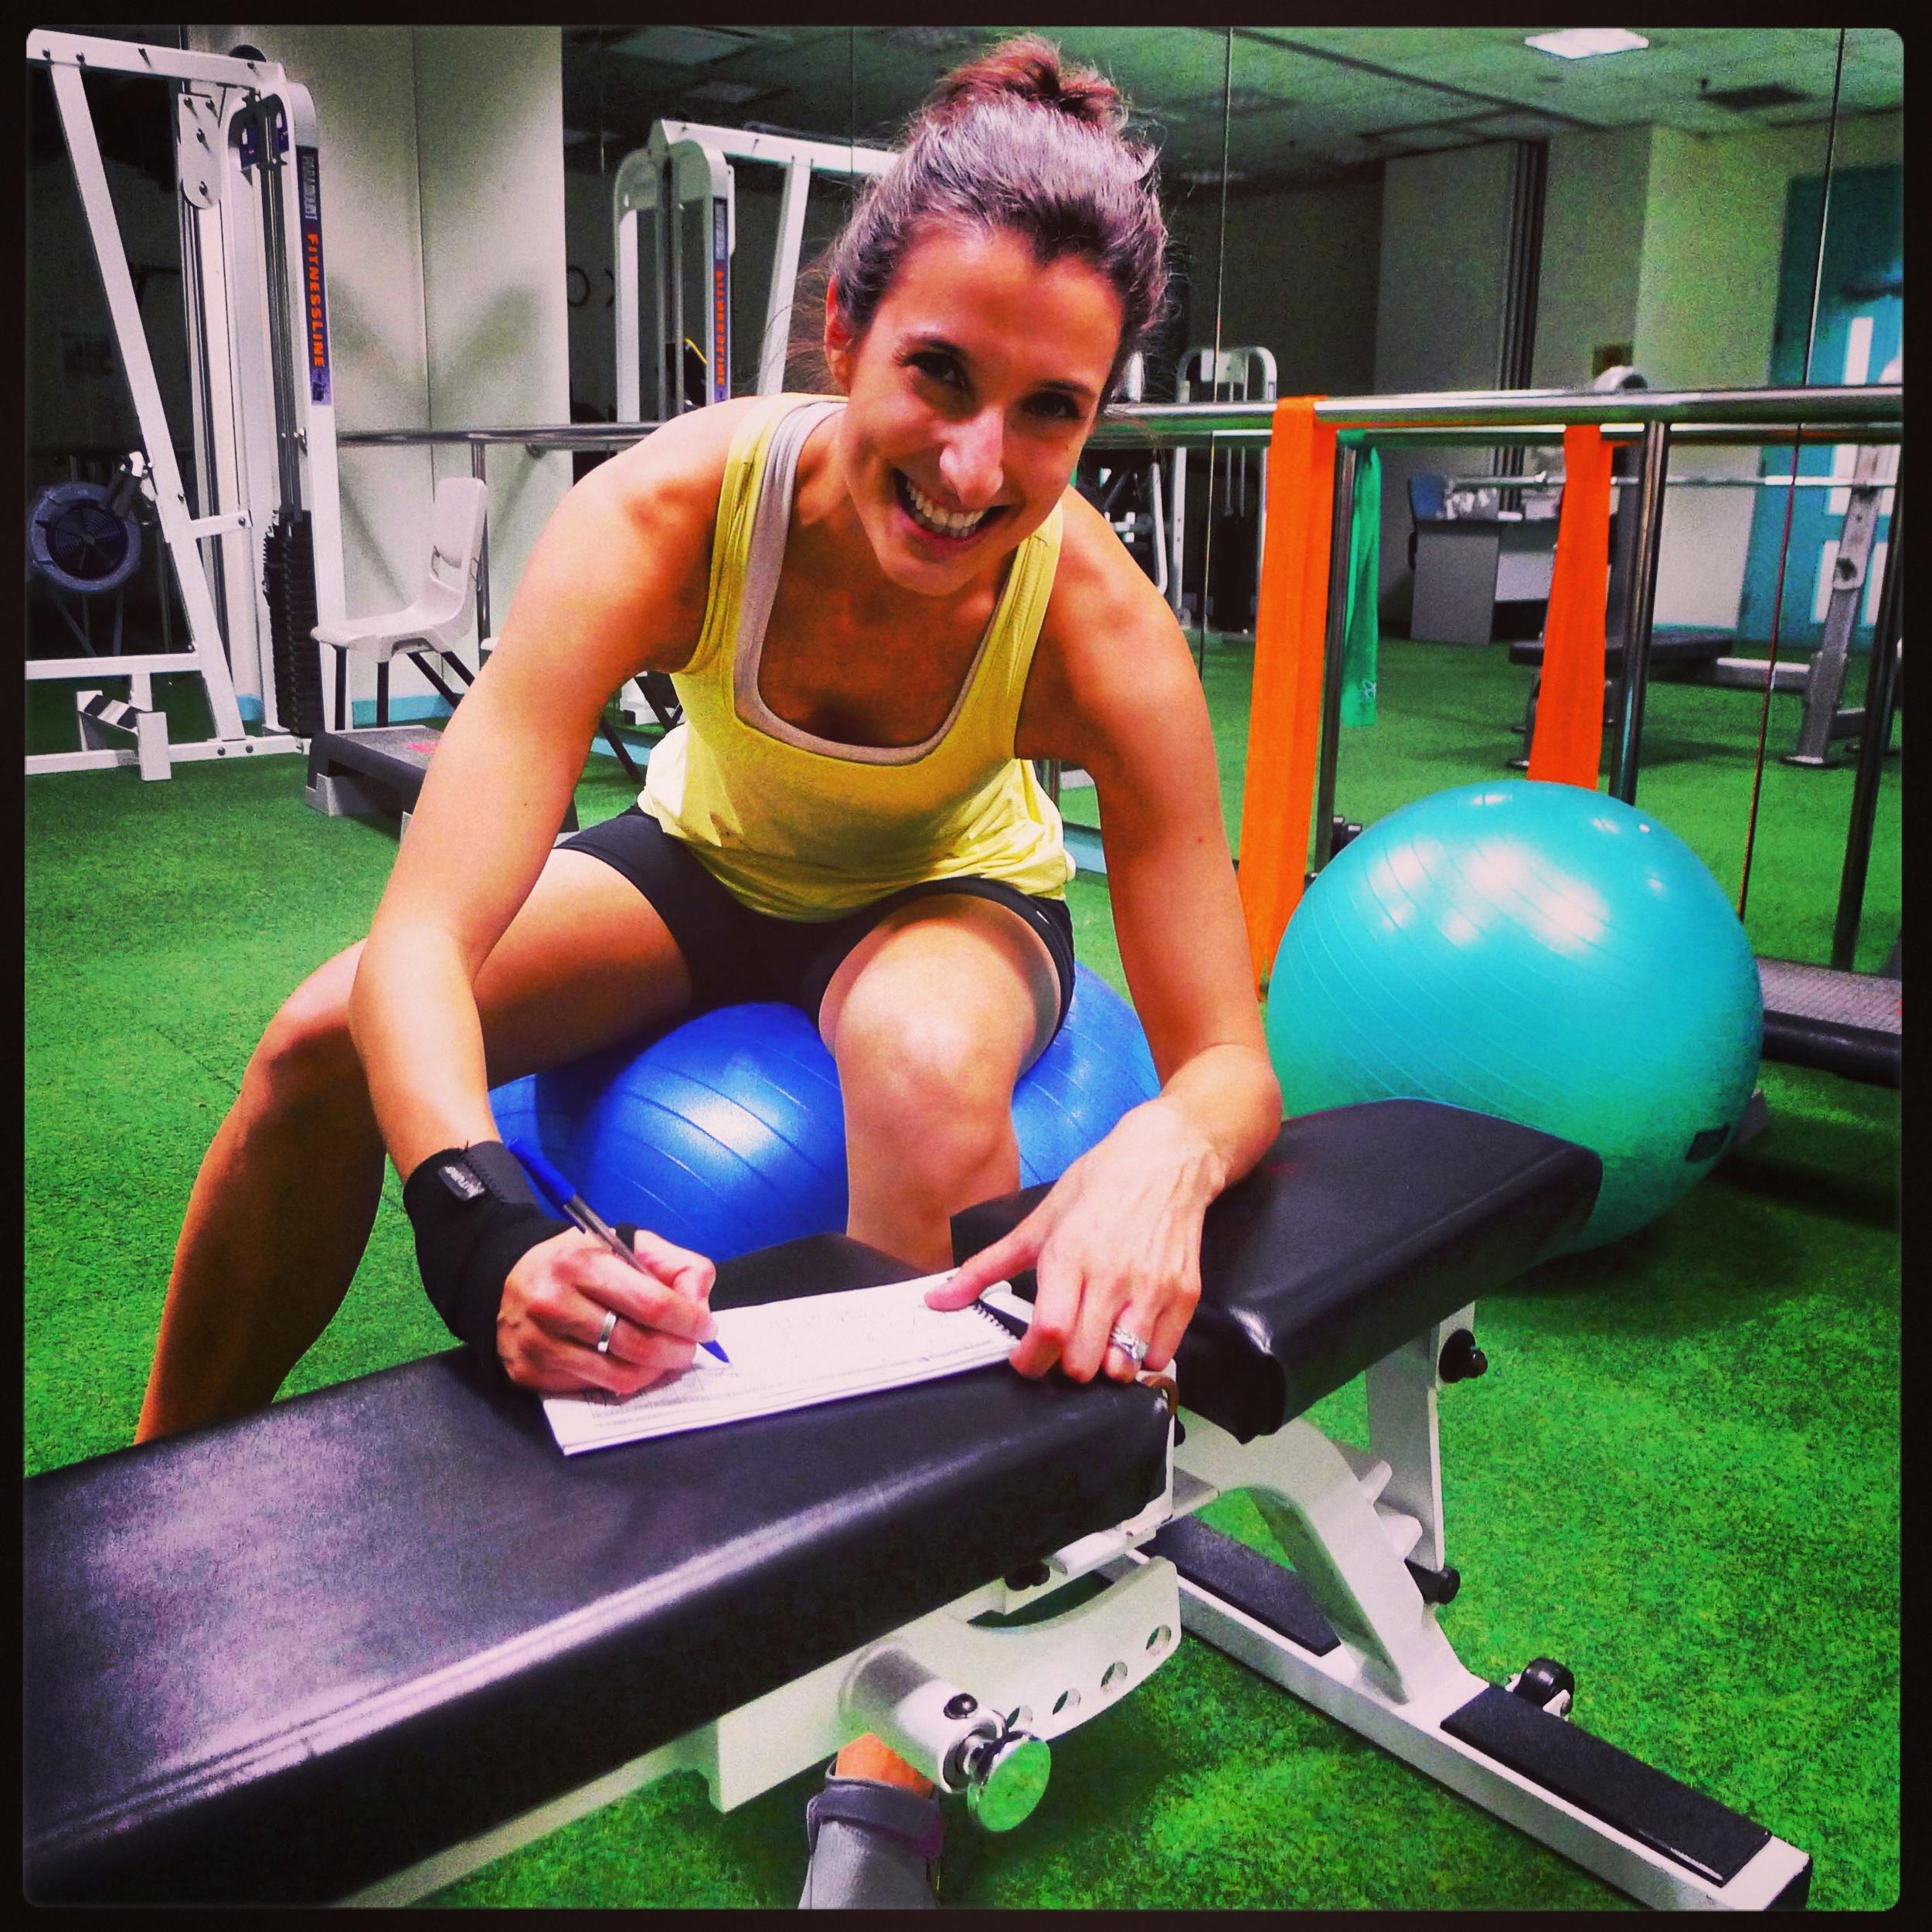 Alison McLaughlin – Registered Dietitian and food enthusiast (Dubai, UAE)